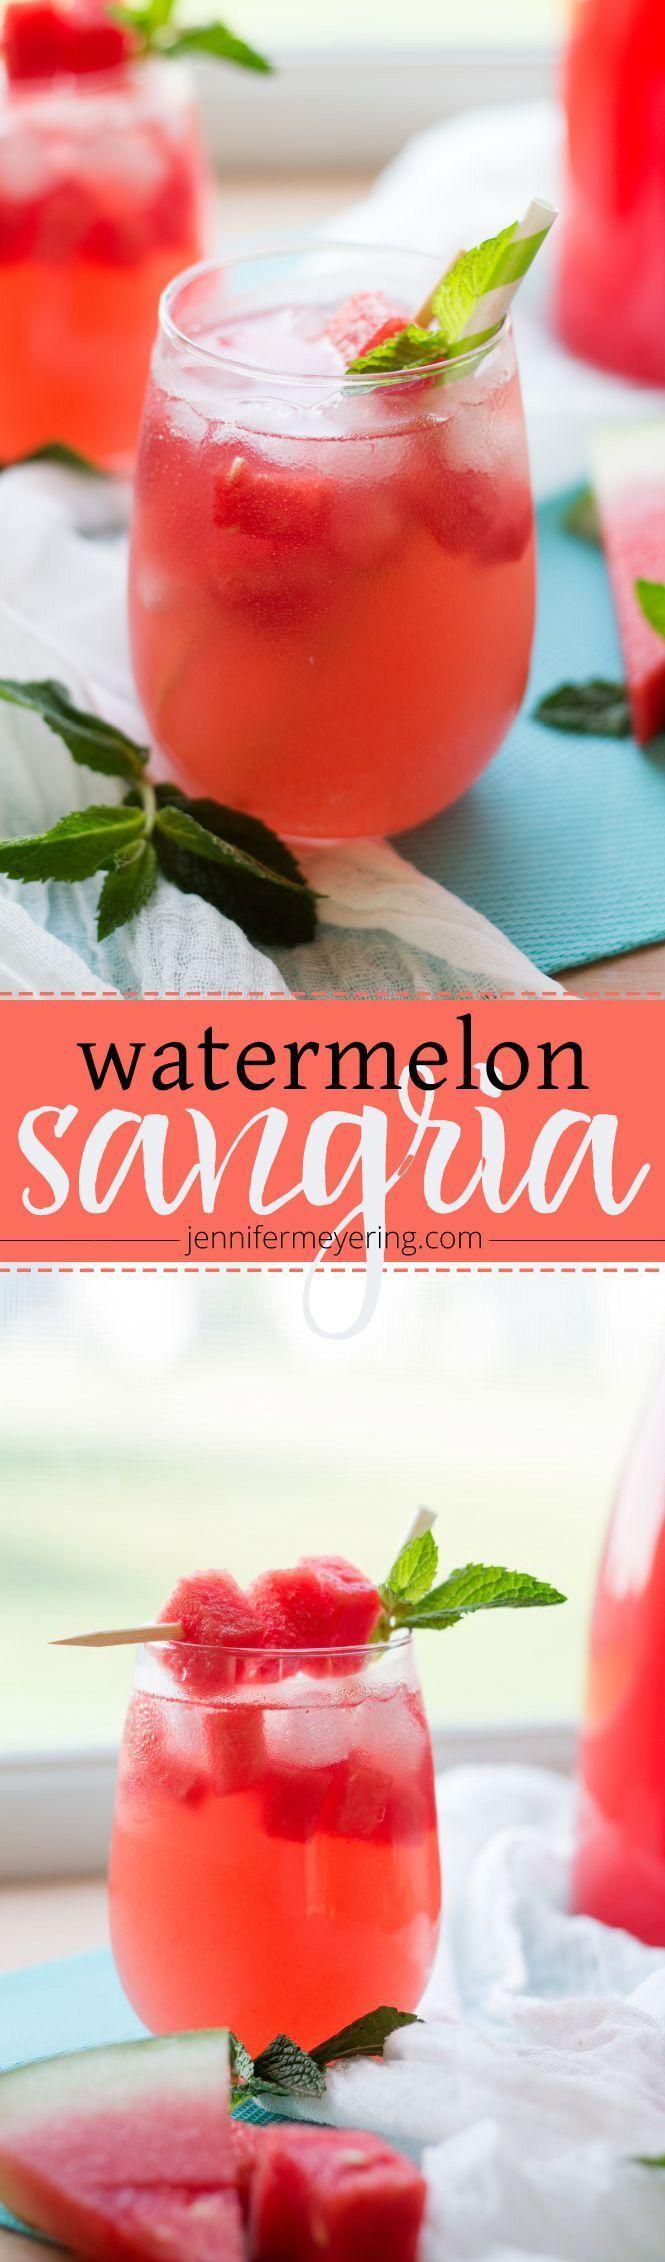 Watermelon Sangria | JenniferMeyering.com